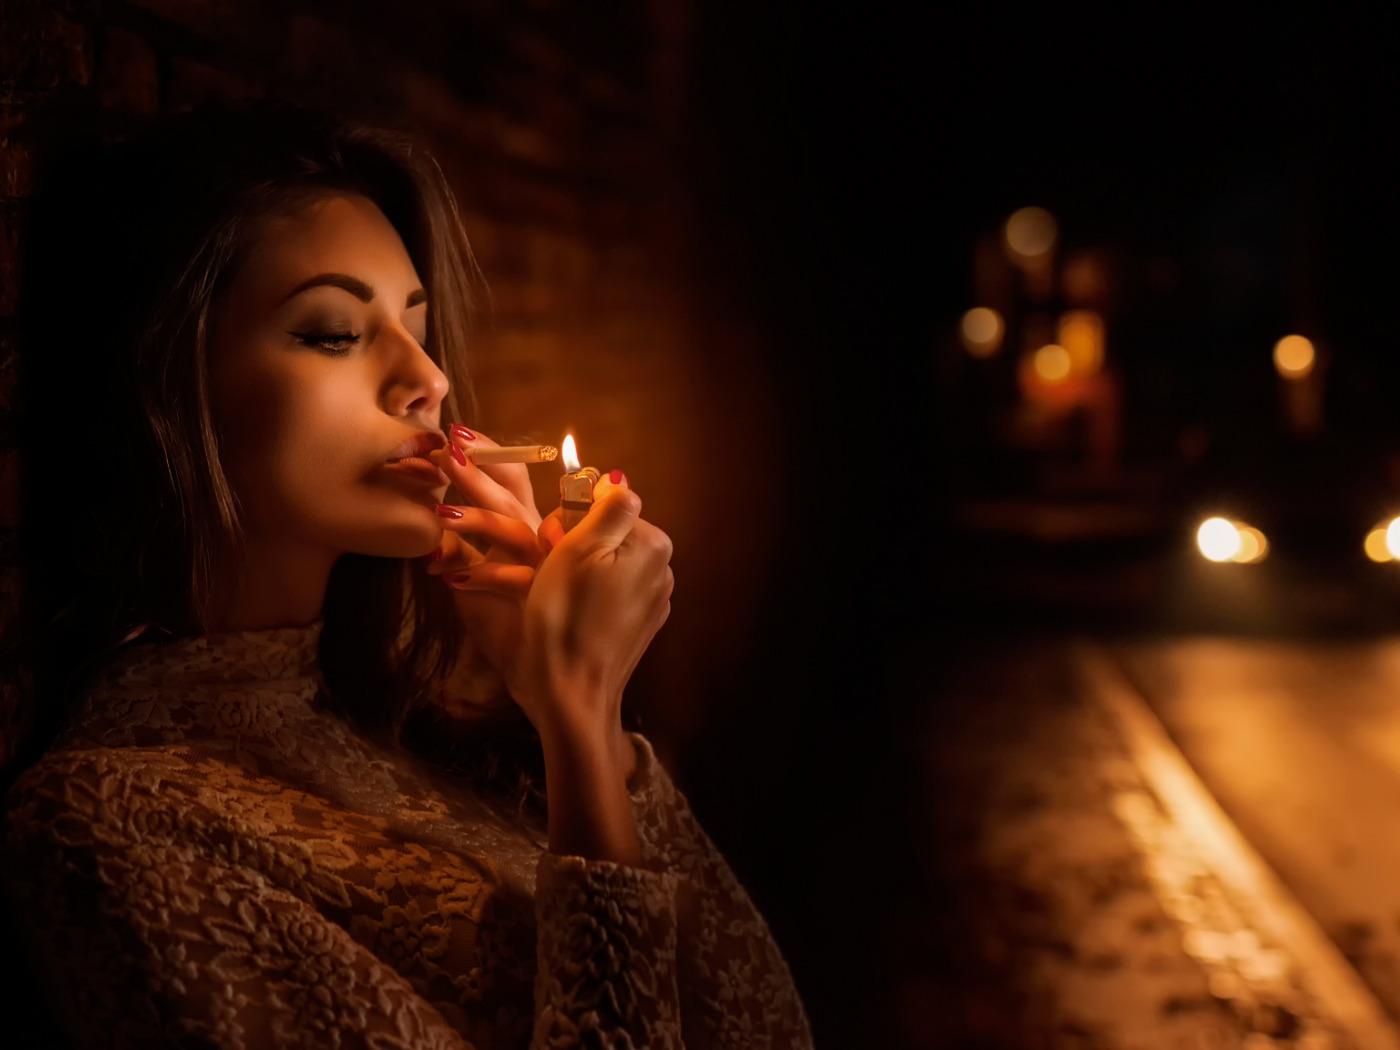 картинка смотри она курит